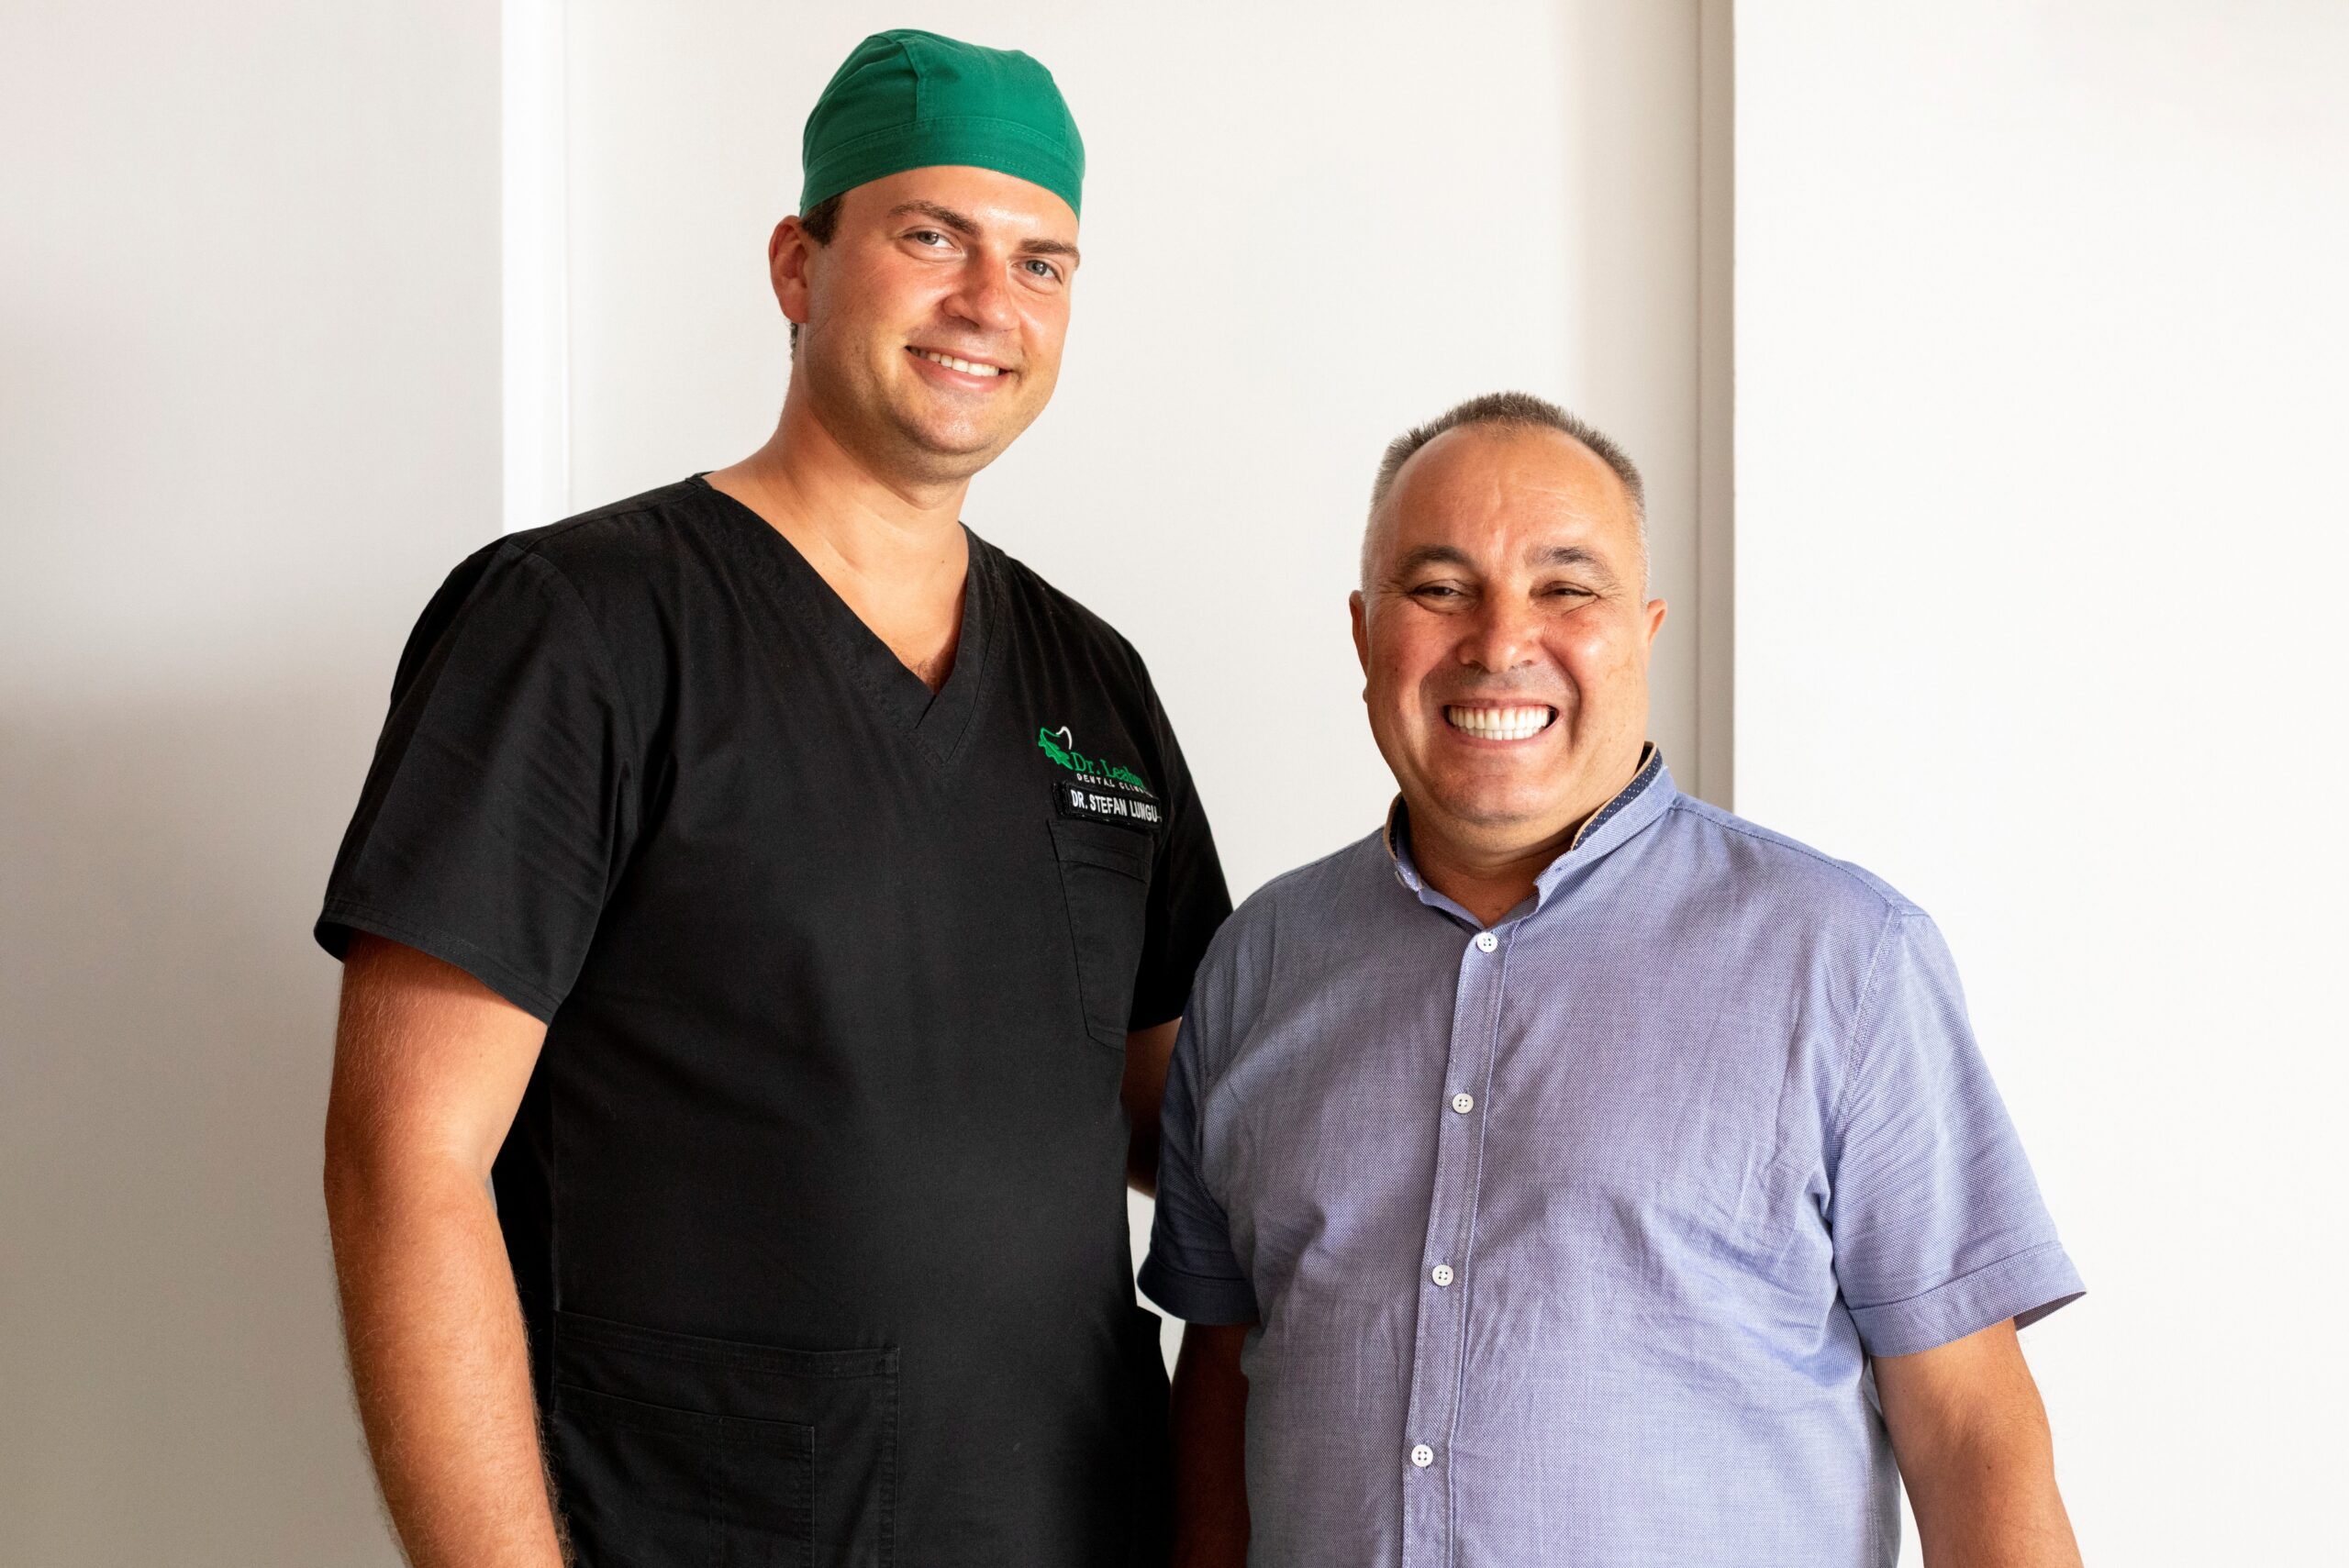 medic stomatolog in stanga, pacient in dreapta